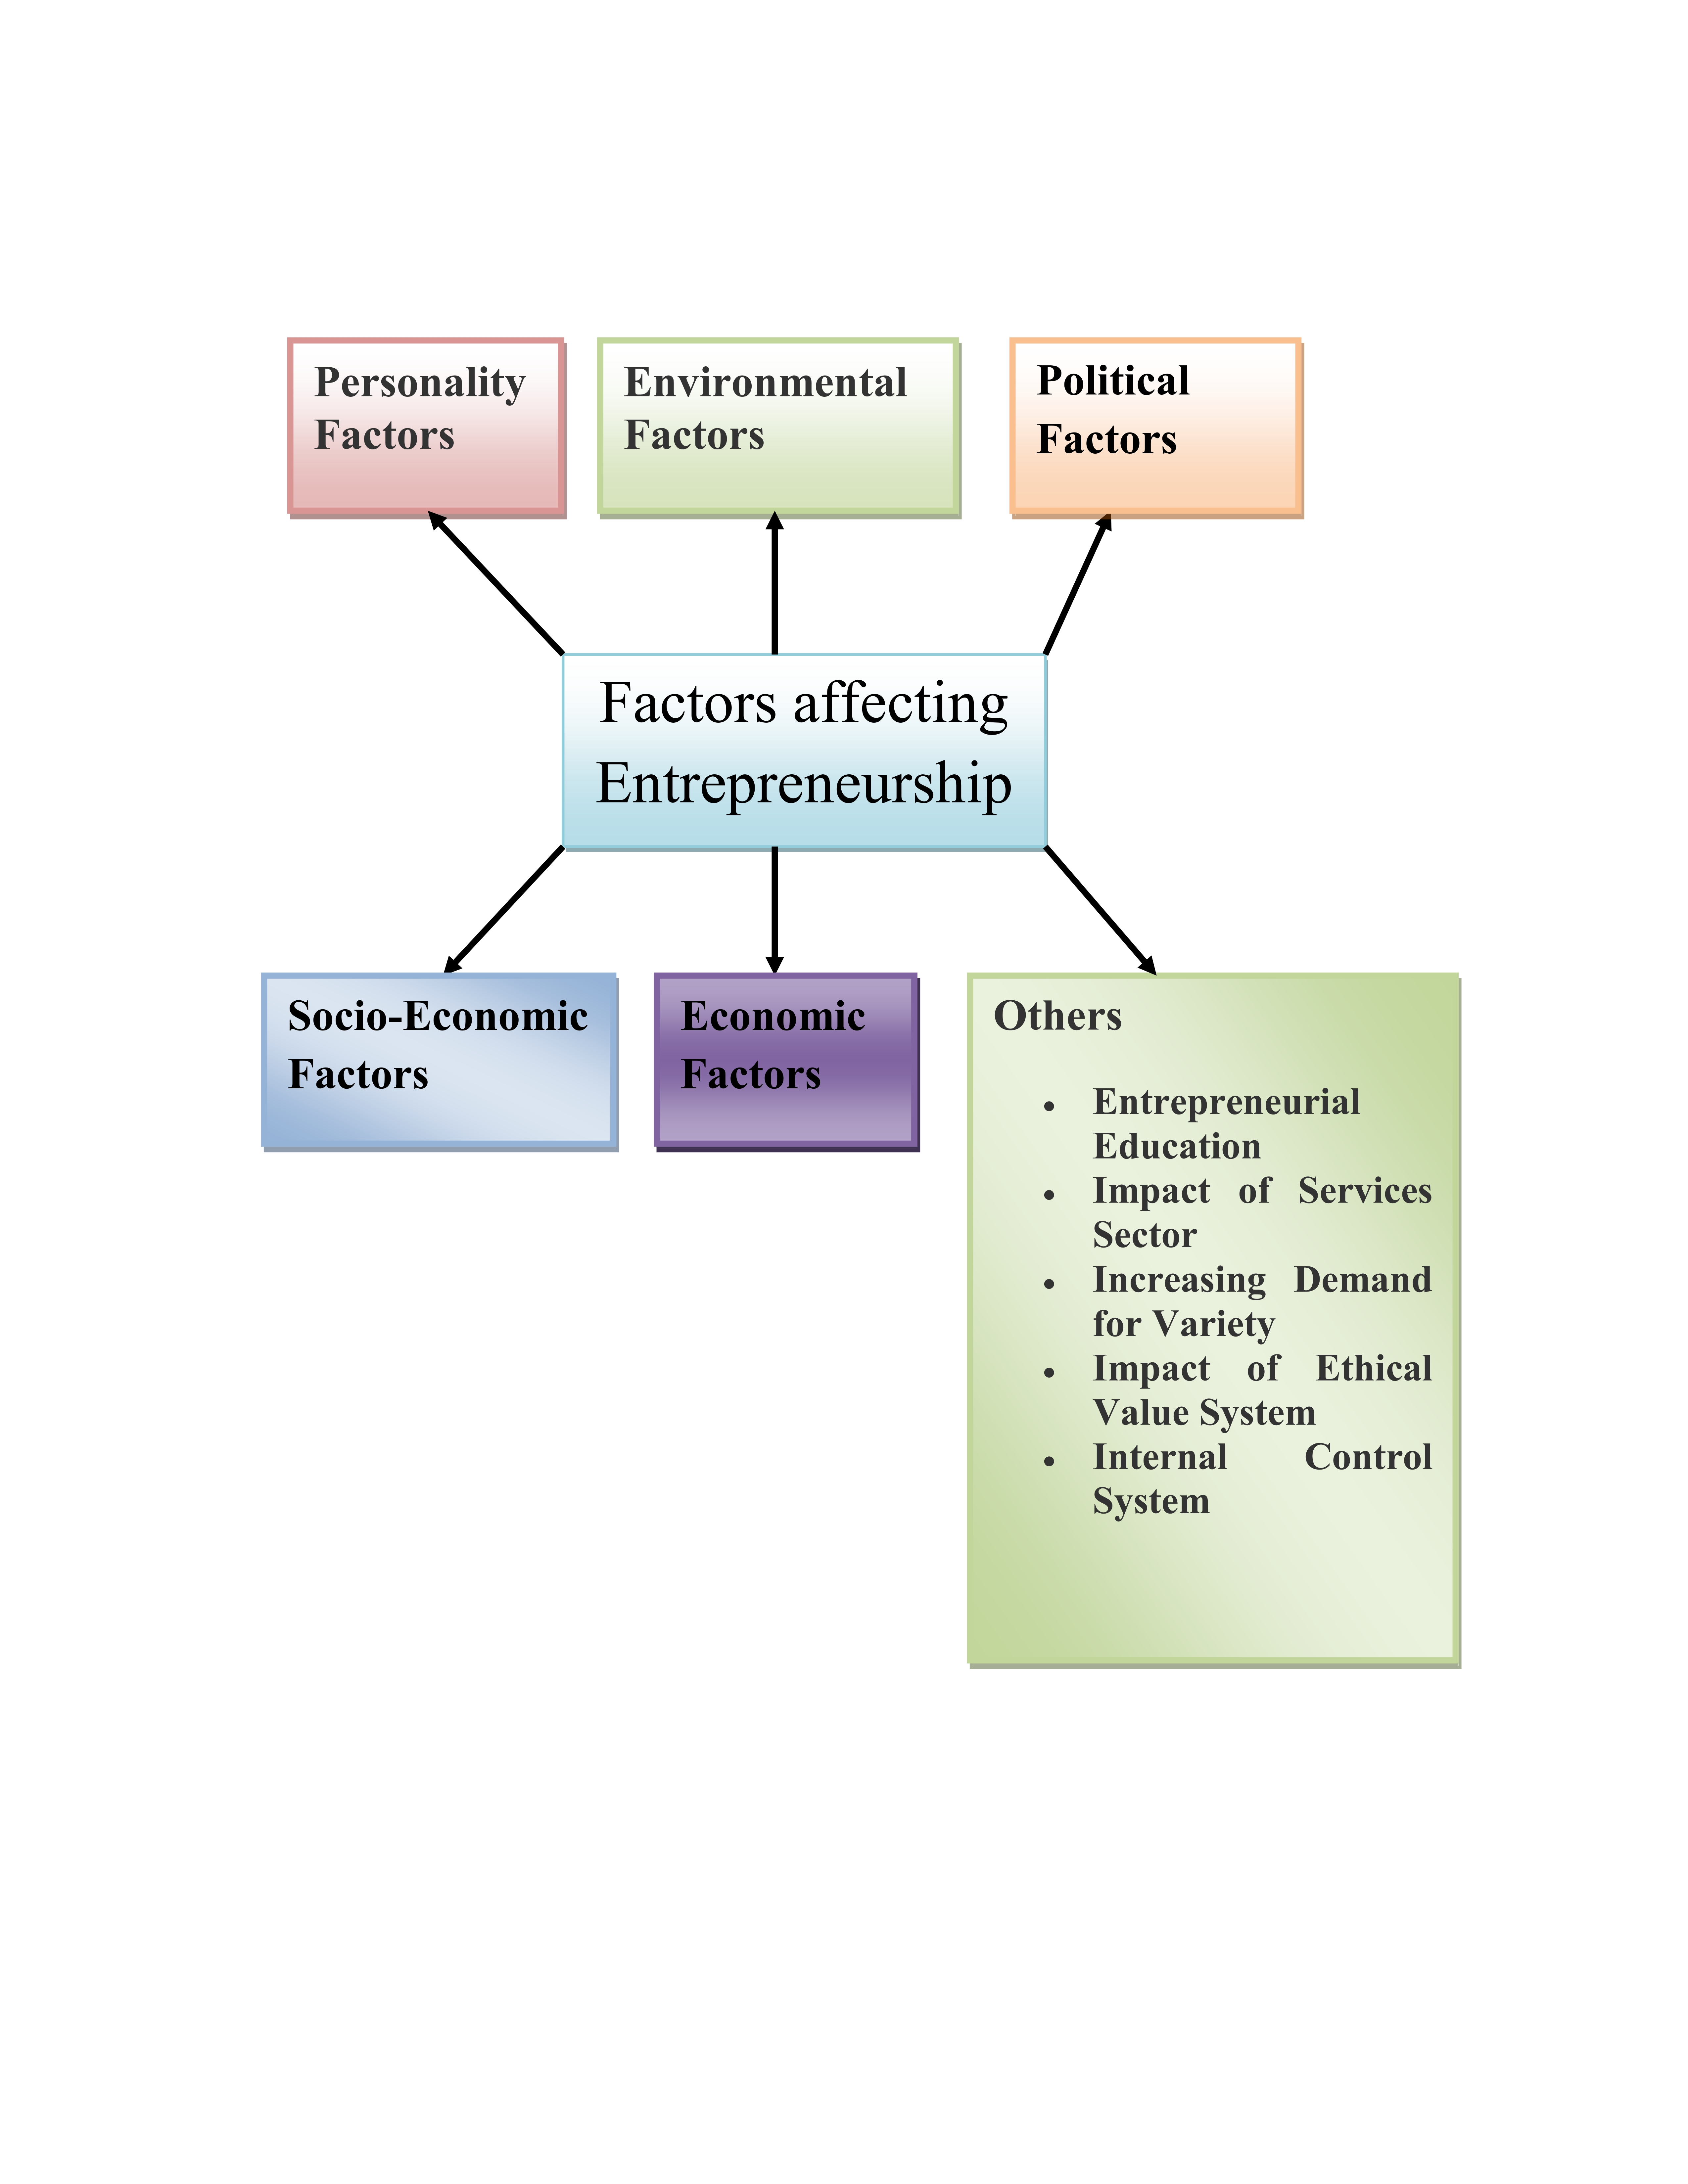 Simplynotes - Factors affecting Entrepreneurship